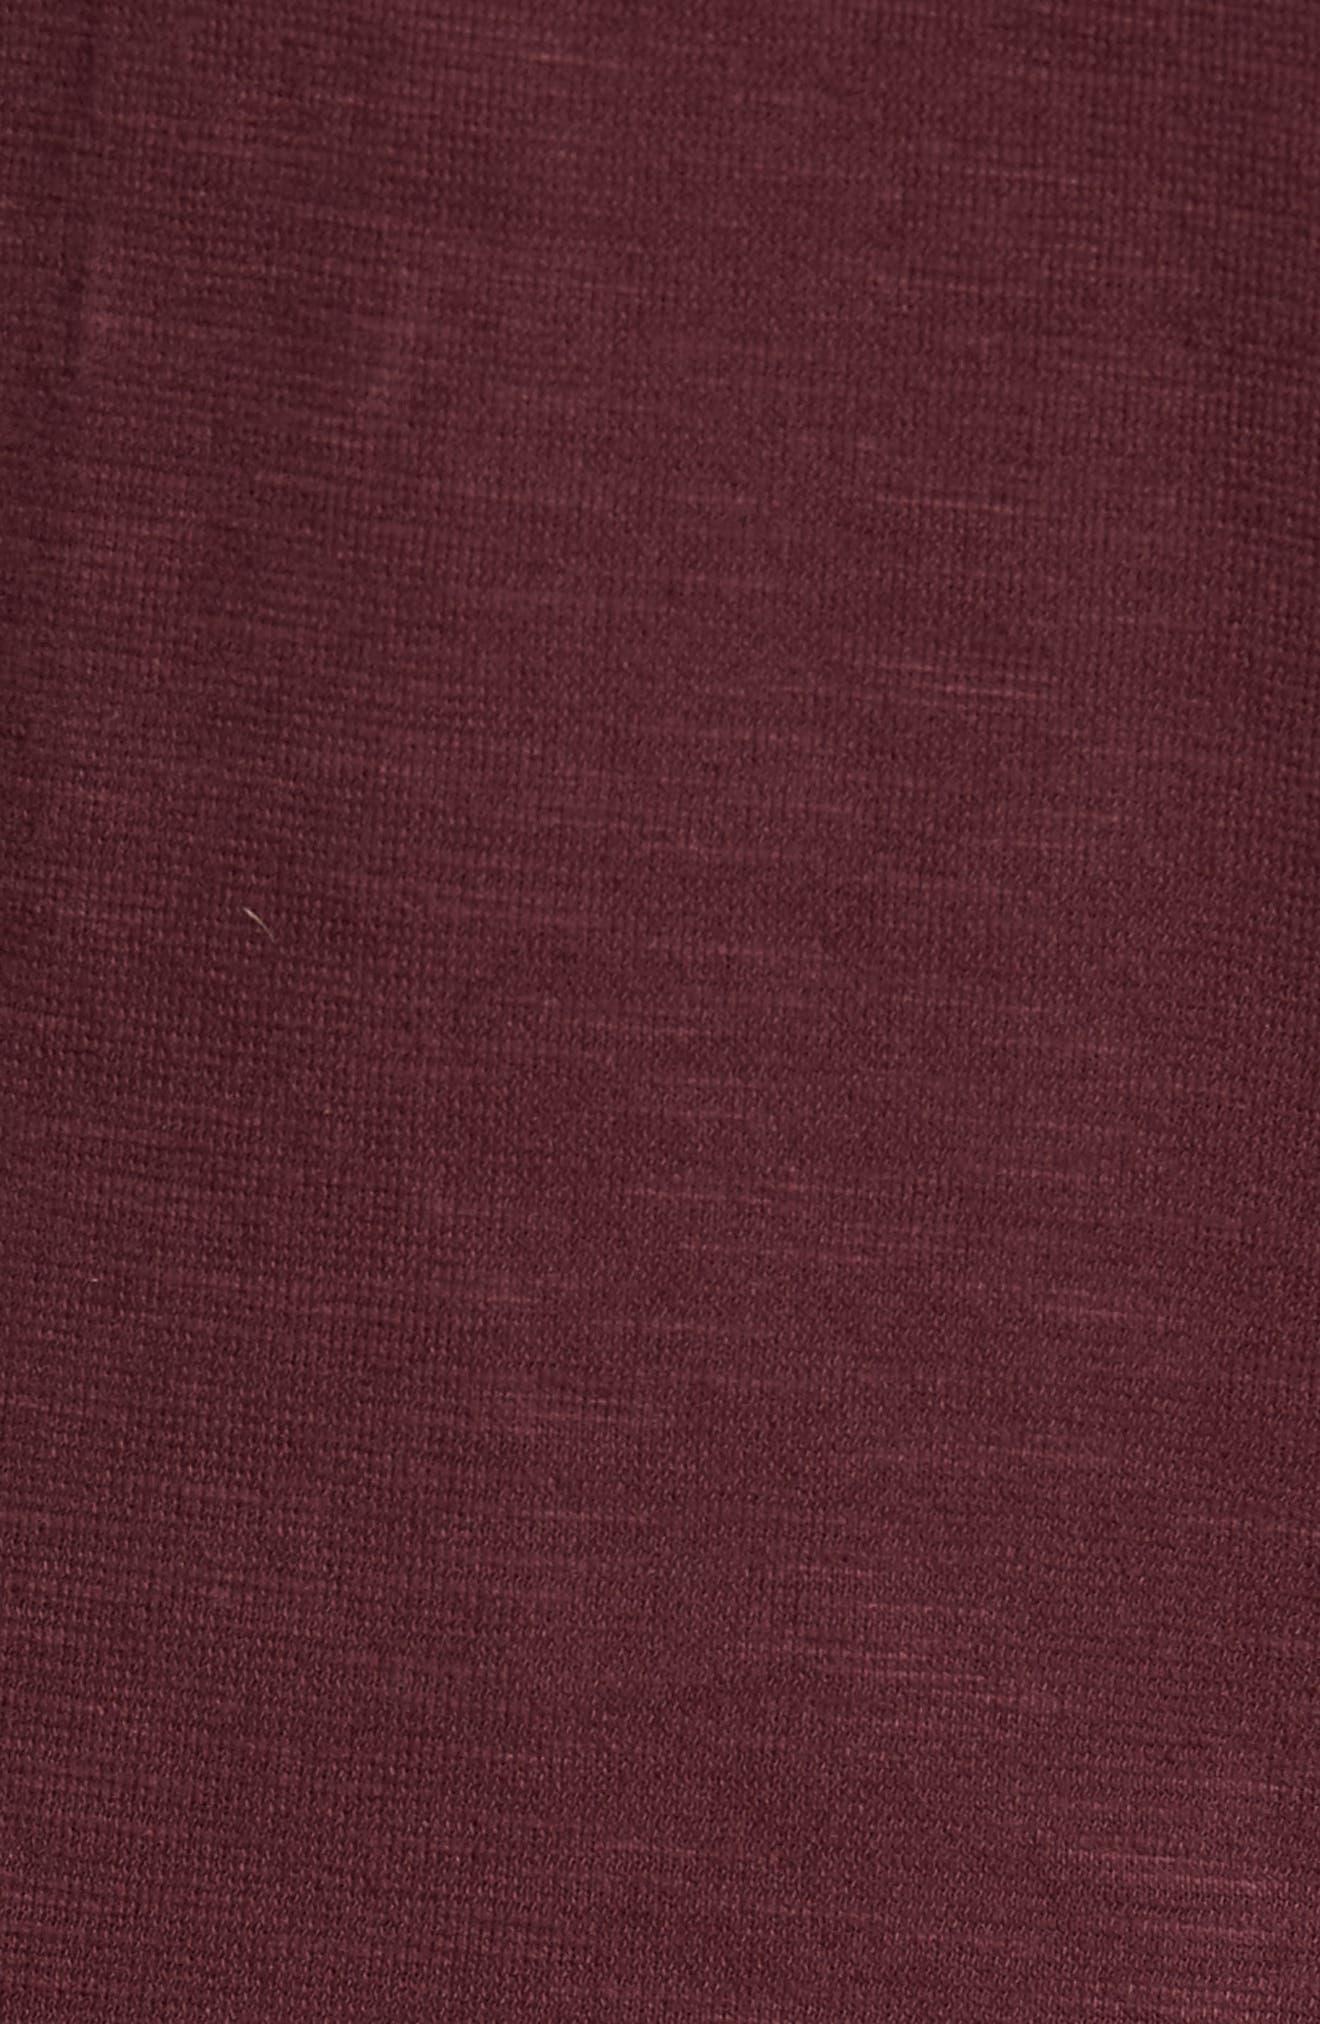 Slim Fit Pullover Hoodie,                             Alternate thumbnail 5, color,                             Wine